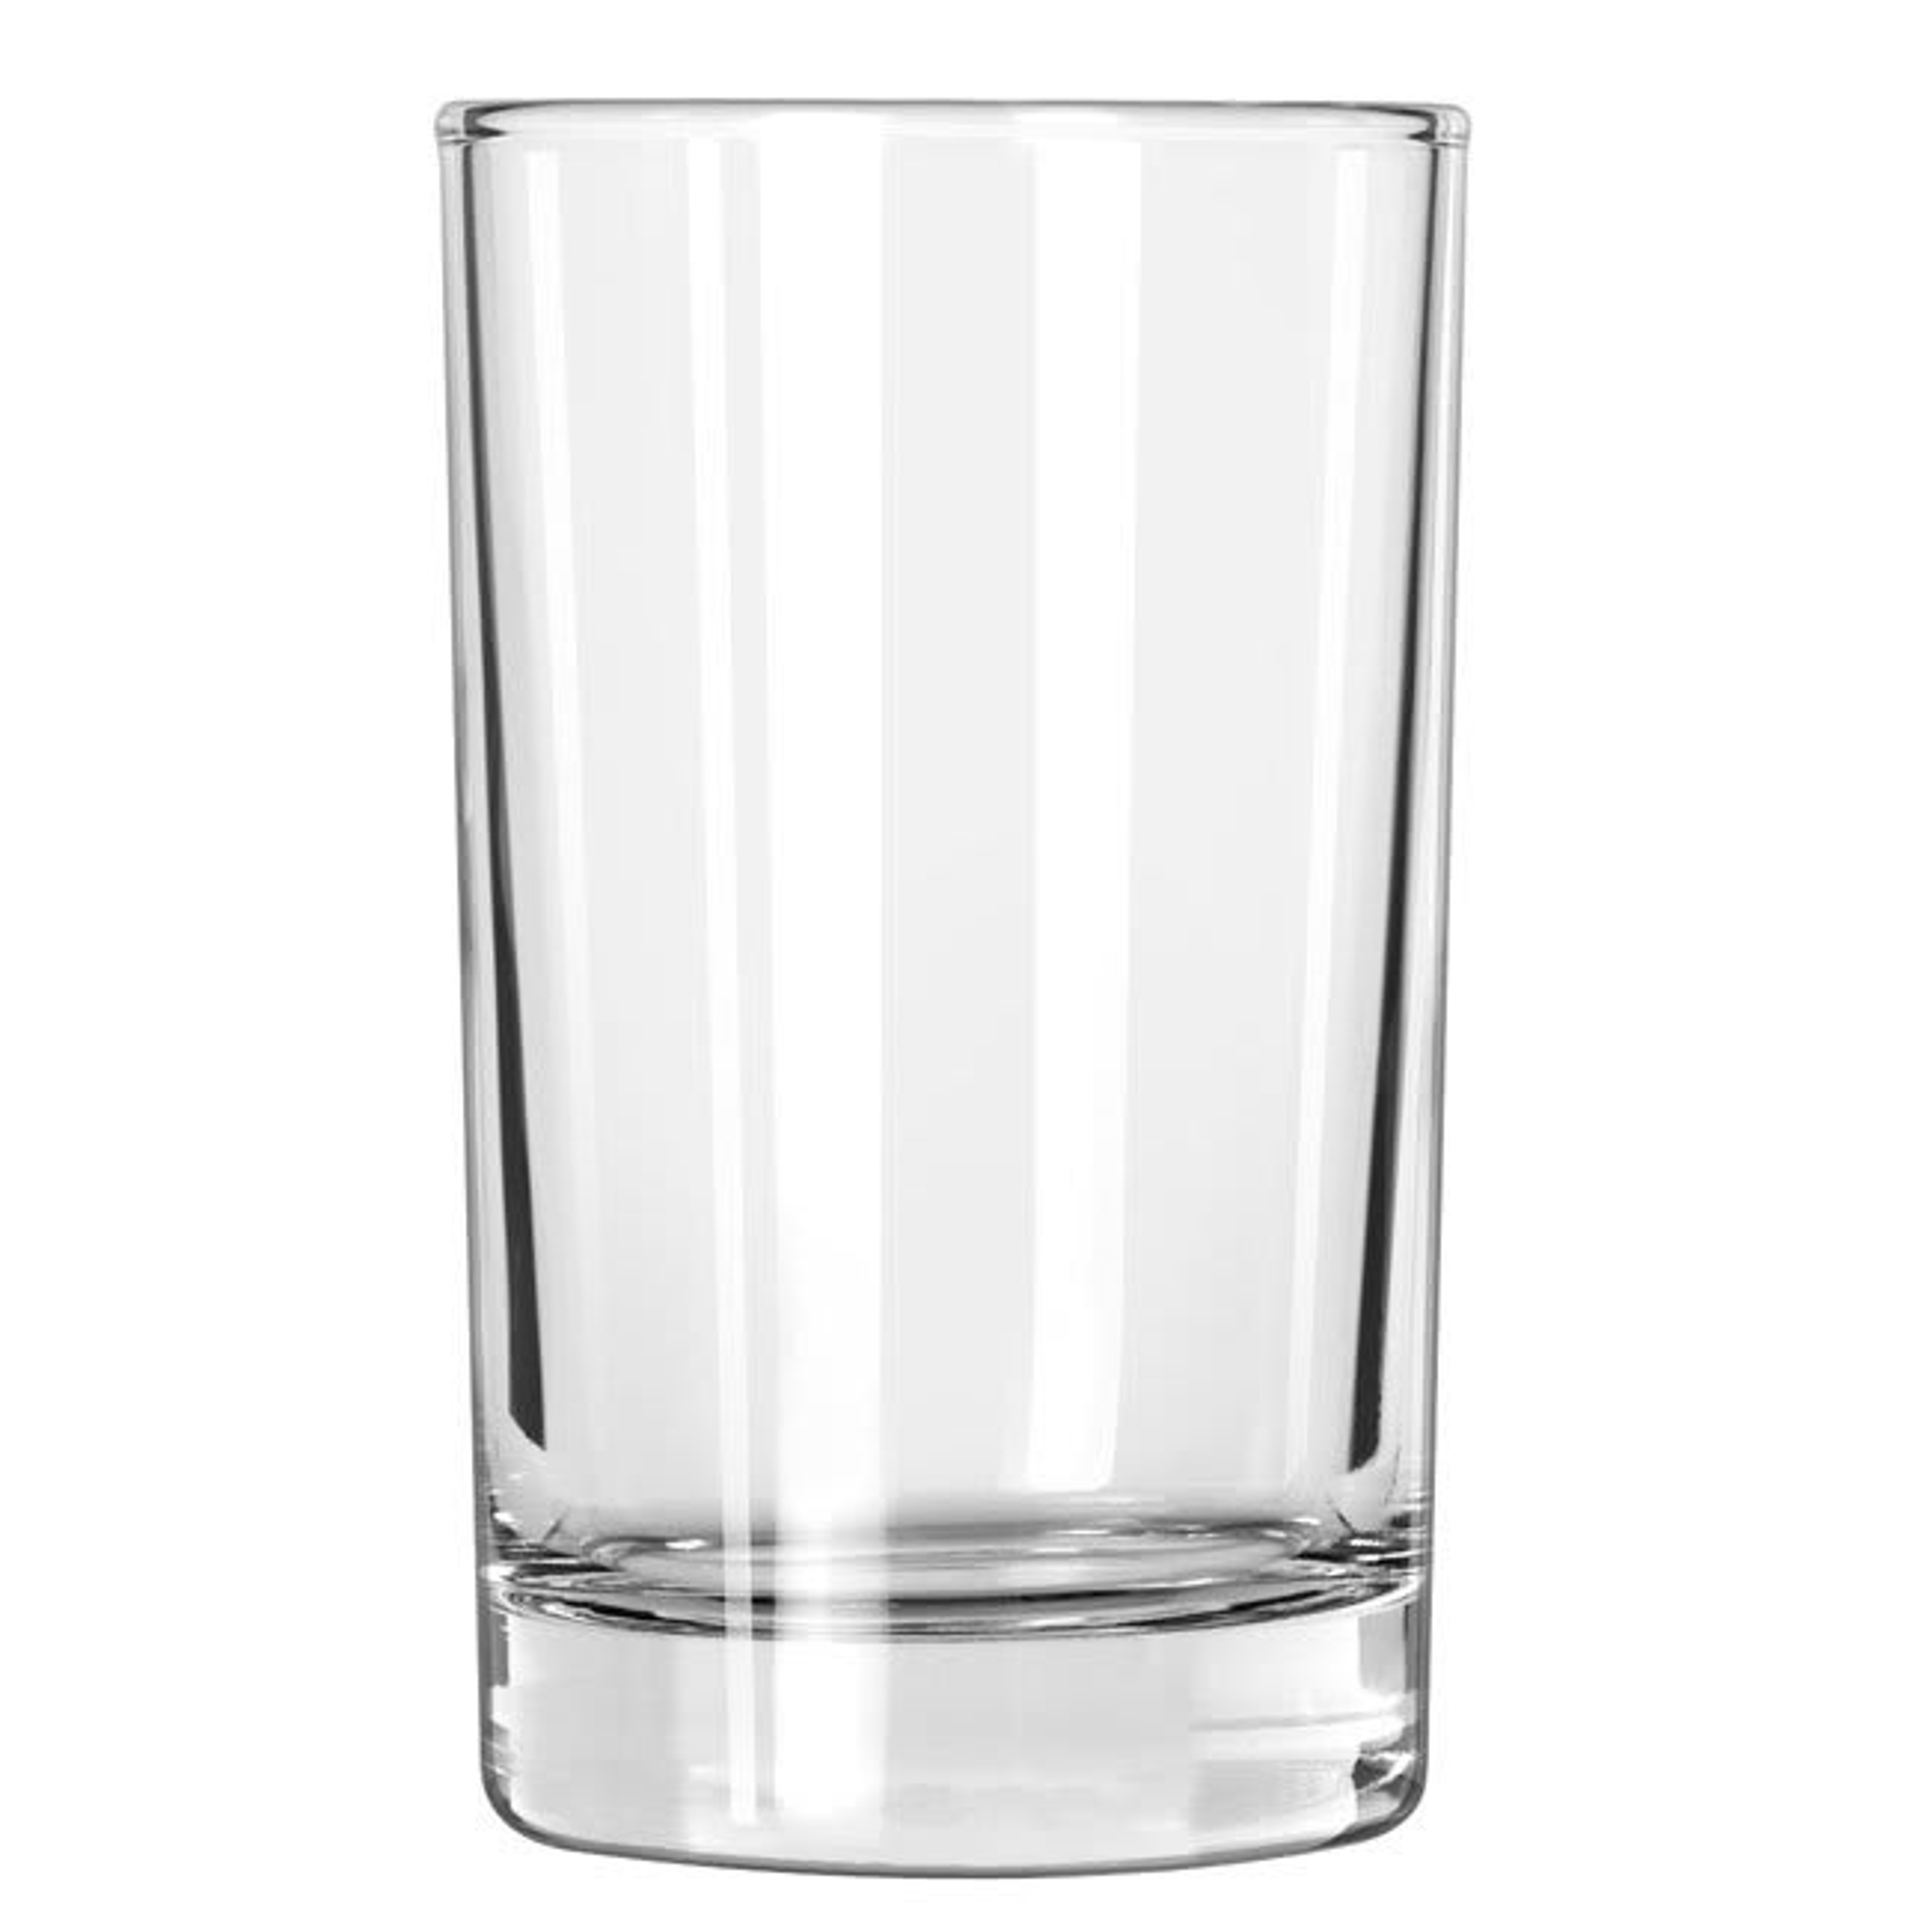 Libbey 151 Heavy Base Split Glass w/ Safedge Rim Guarantee, 6-oz